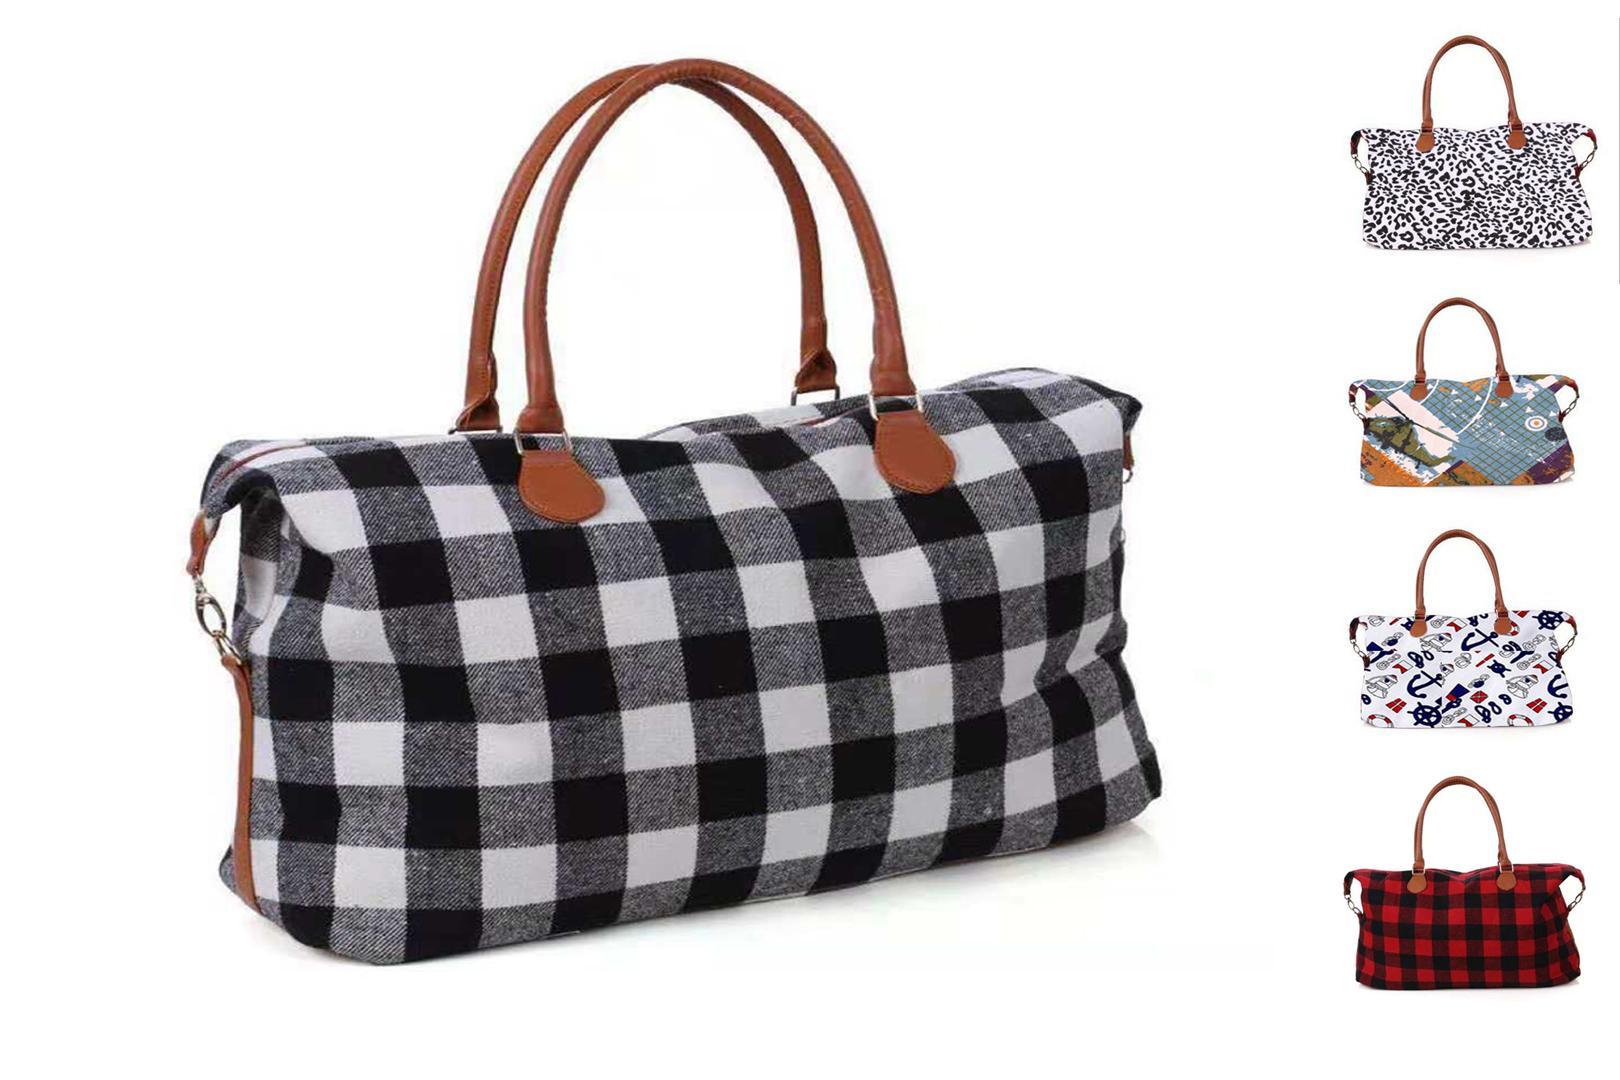 Christmas Lilly check bag designer handbags buffalo check large Capacity travel bag Maternity black red cheetah with PU Handle women bags